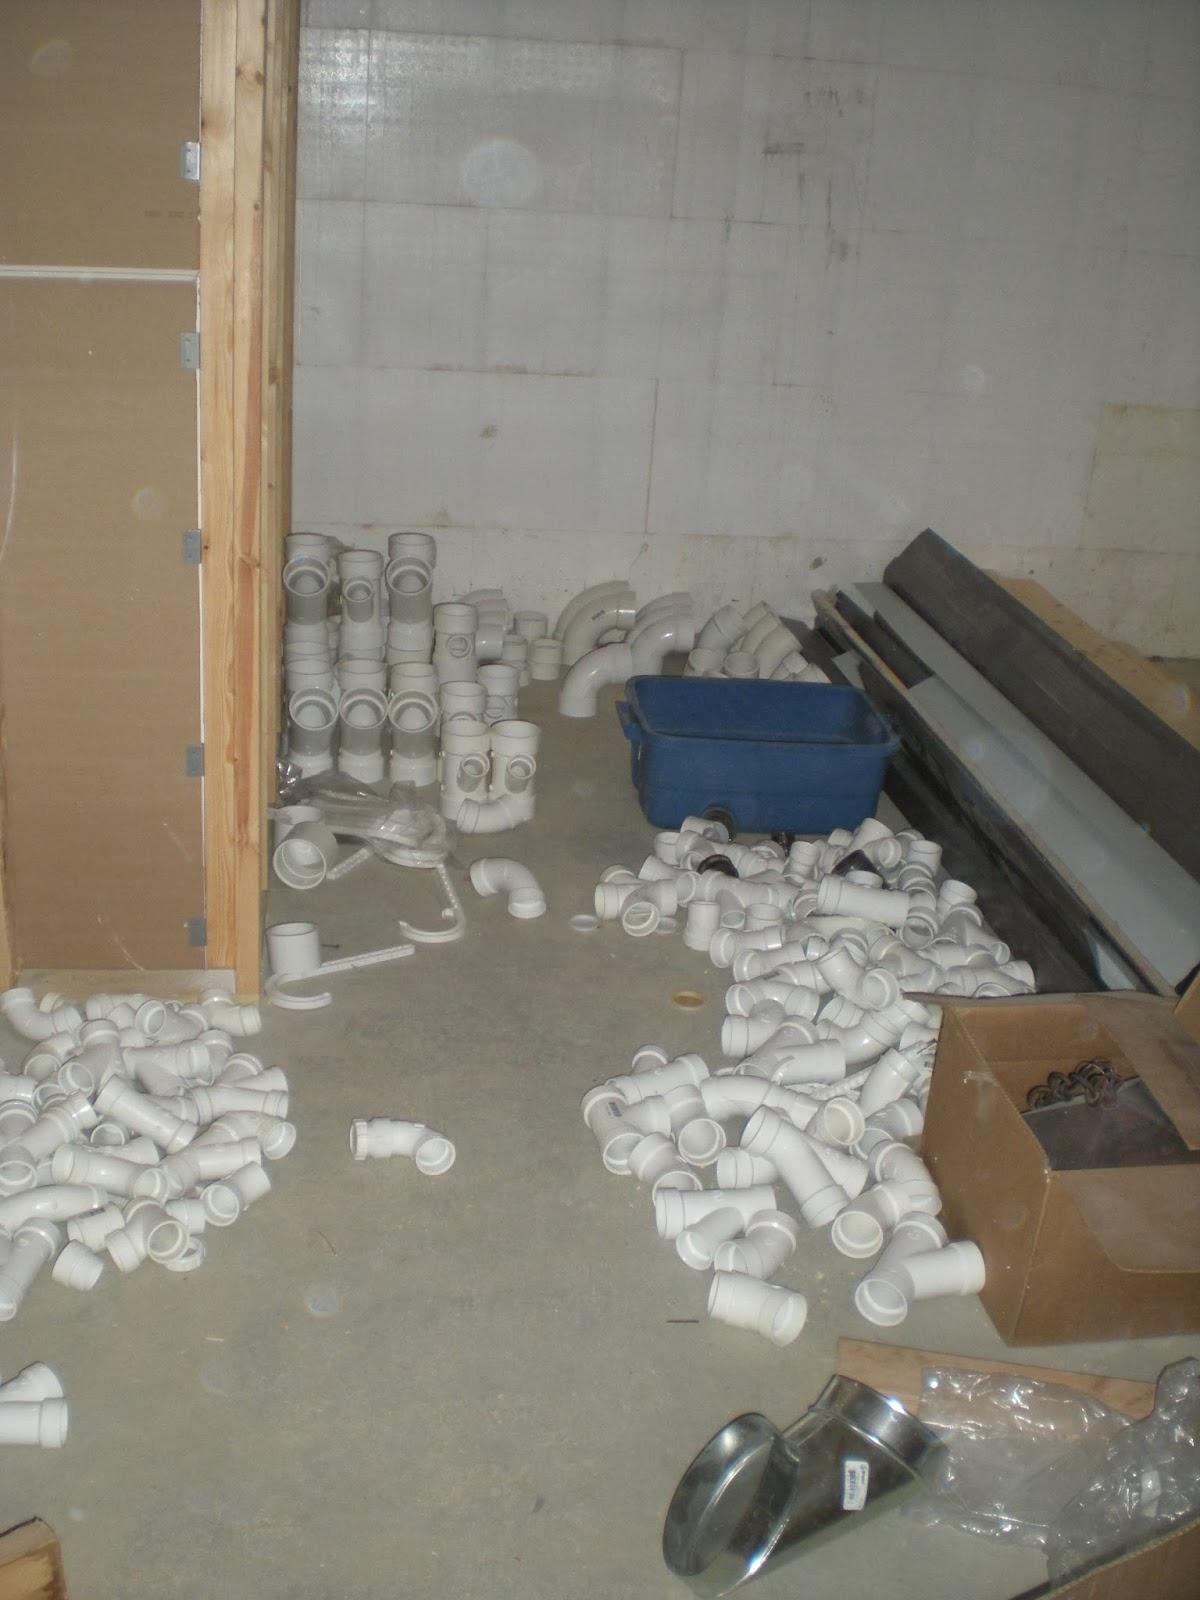 plumbing evidence, huismanconcepts.com,